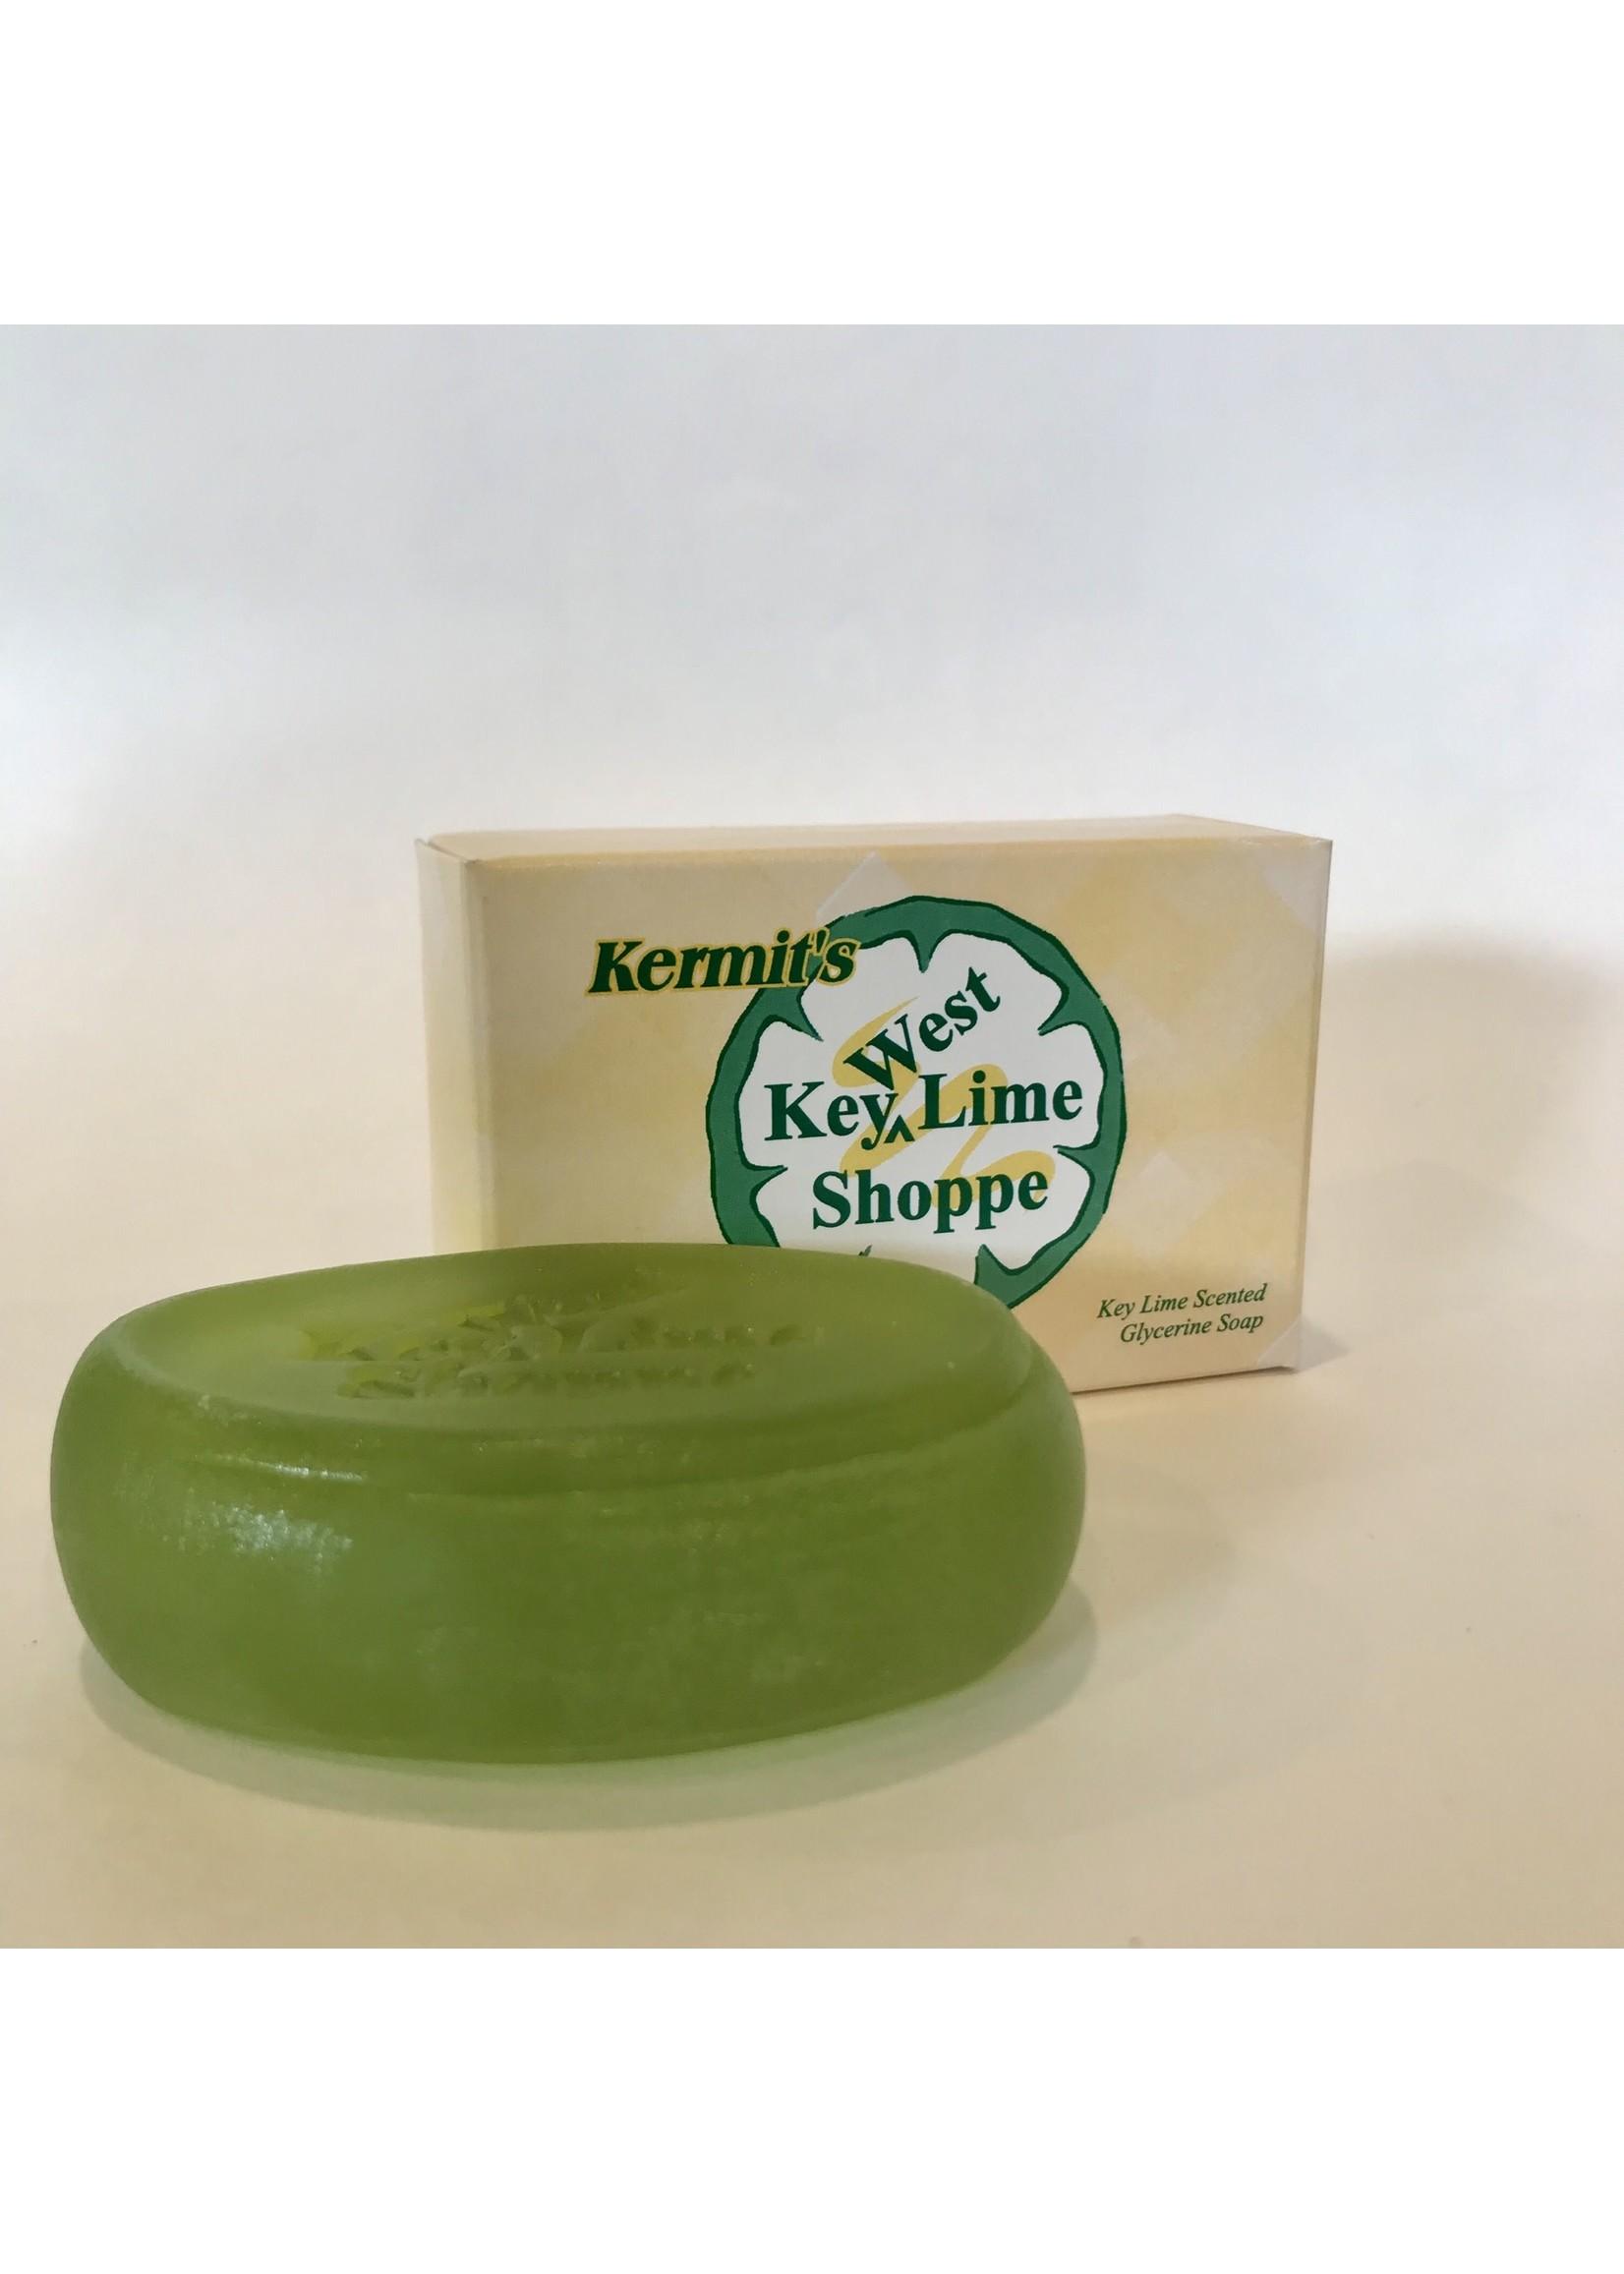 Kermit's Key Lime Glycerin Soap Bath Bar 3 oz.